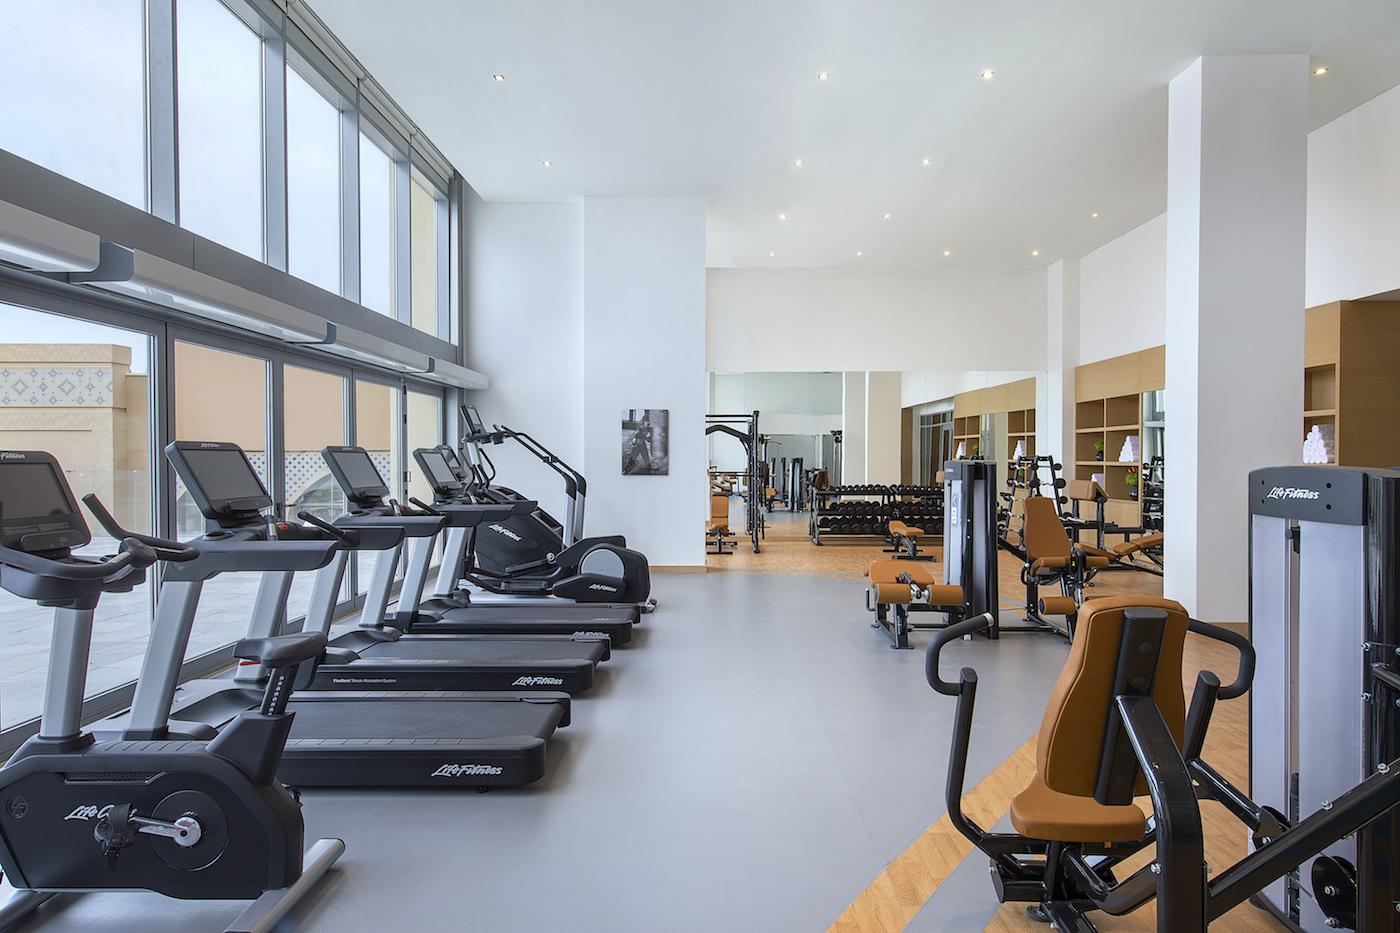 Avani Ibn Battuta Dubai gym